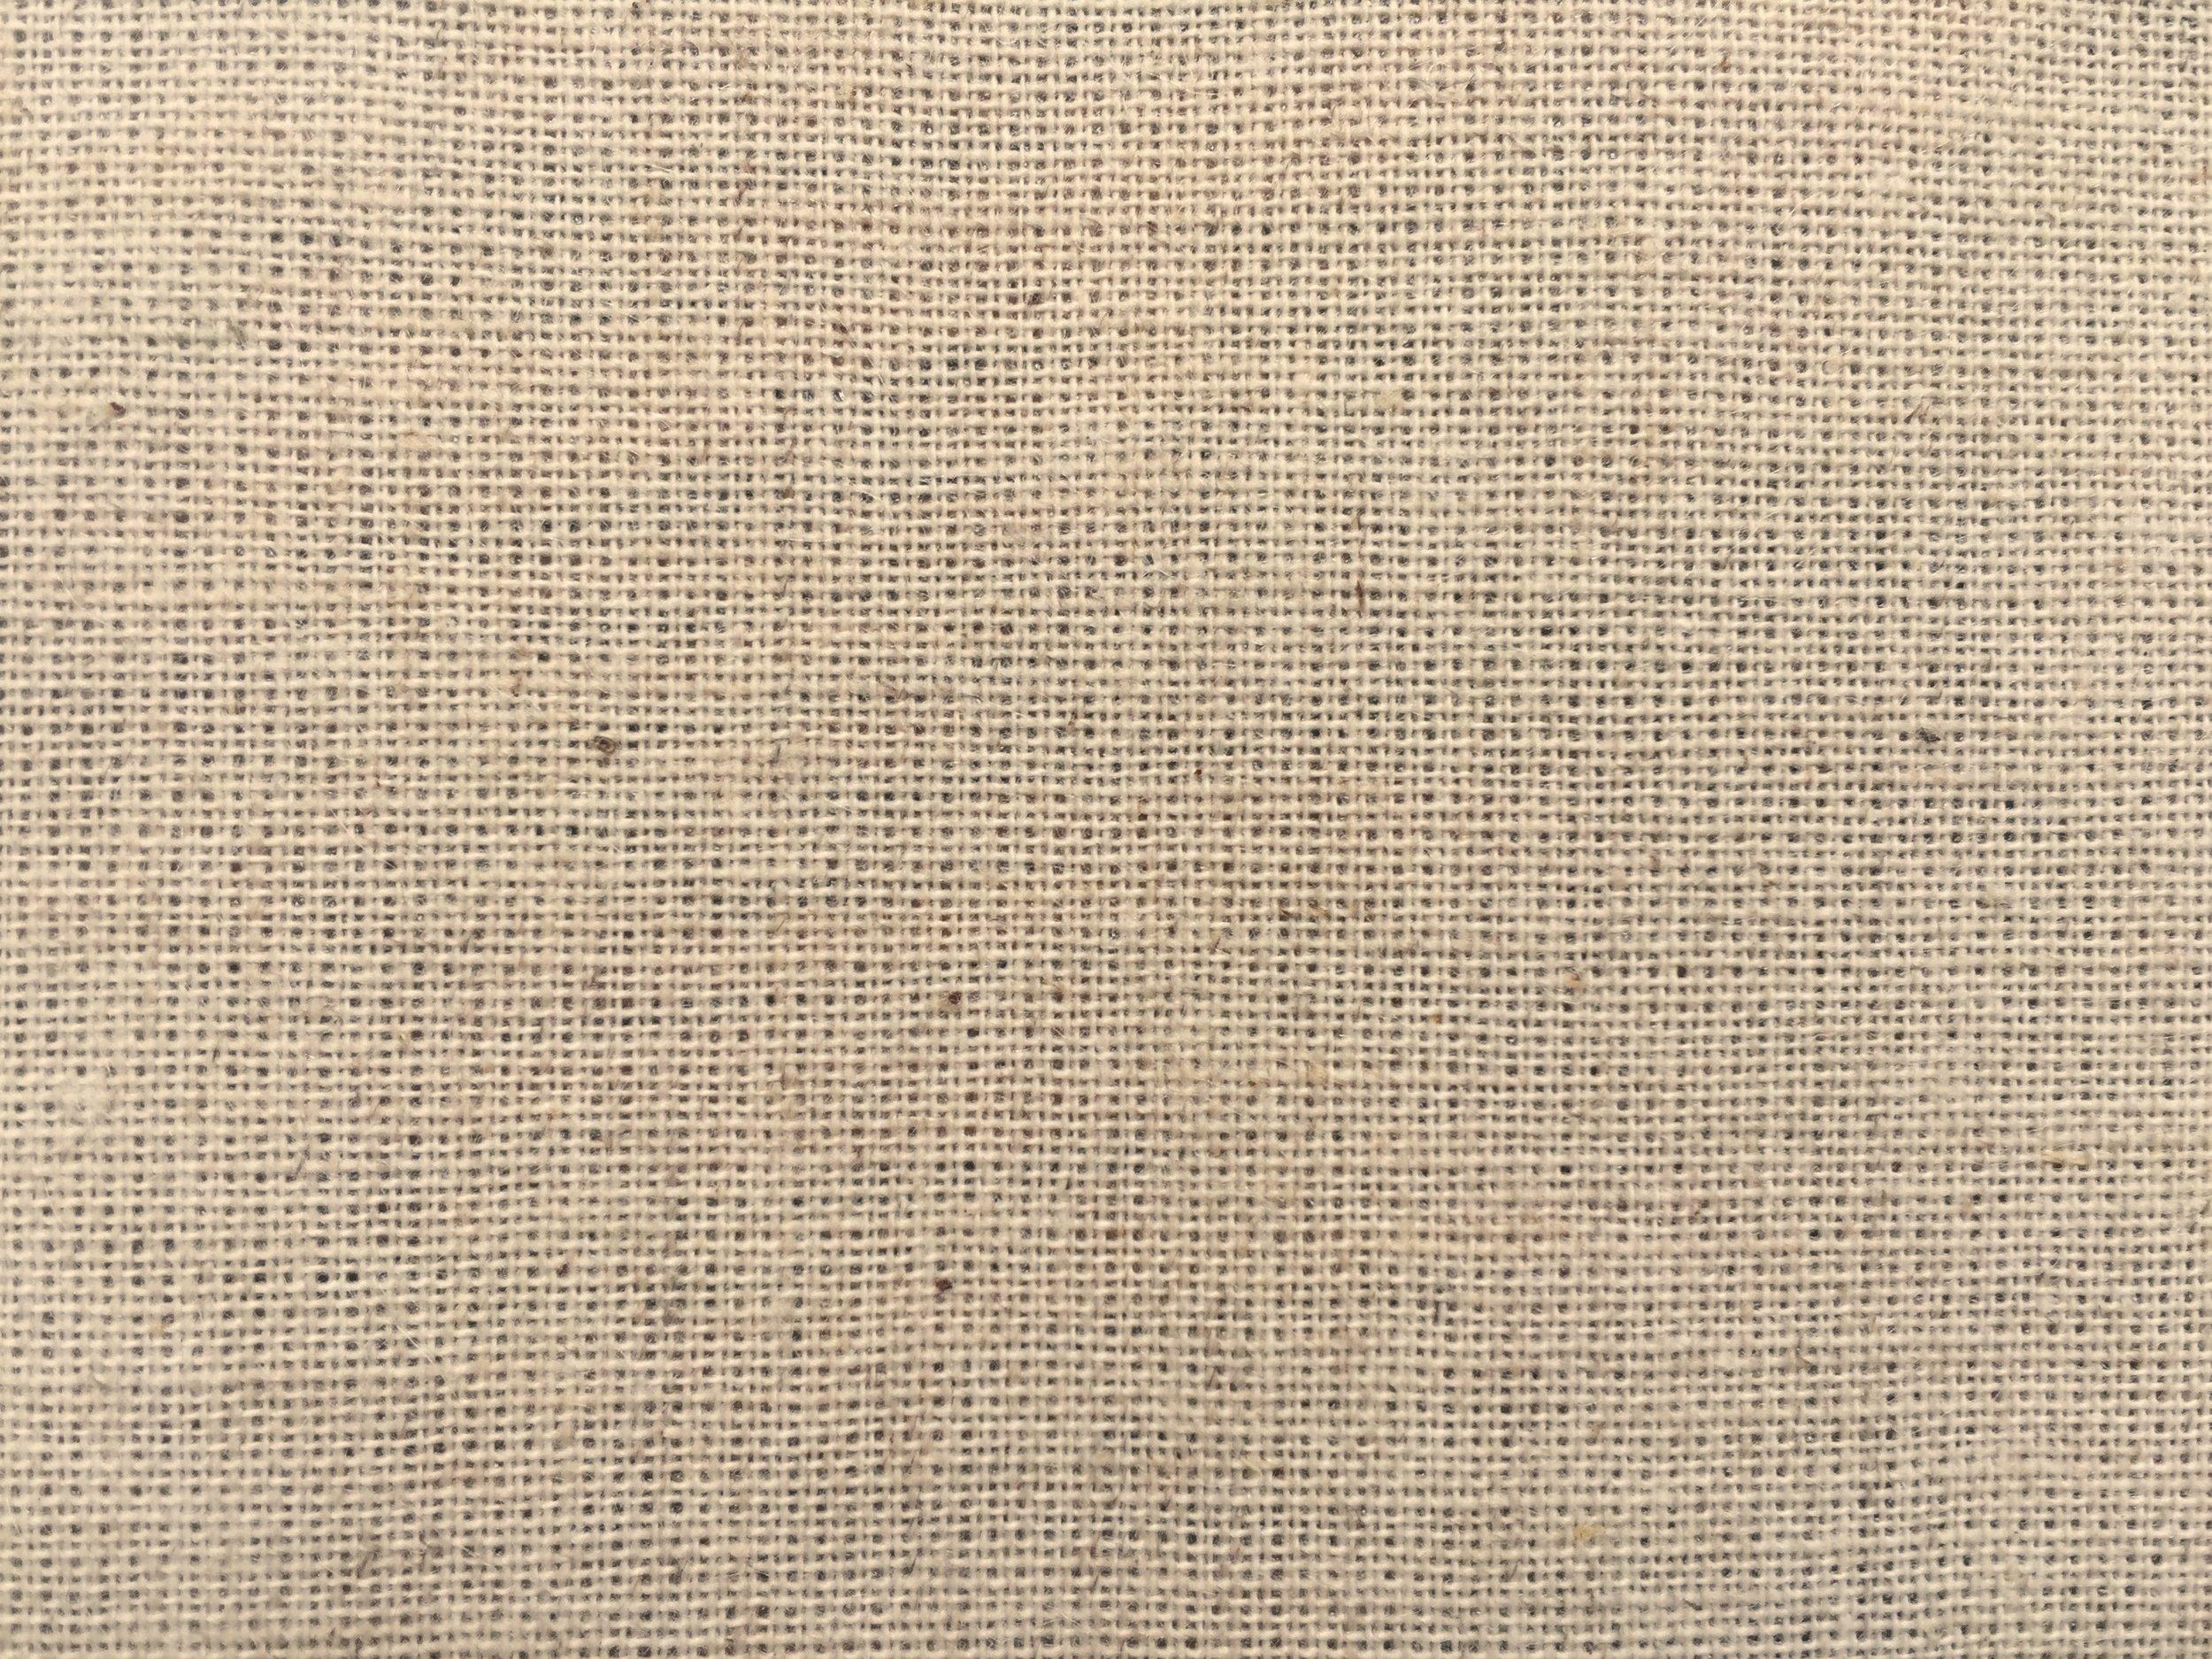 Naturals - Raw Cotton